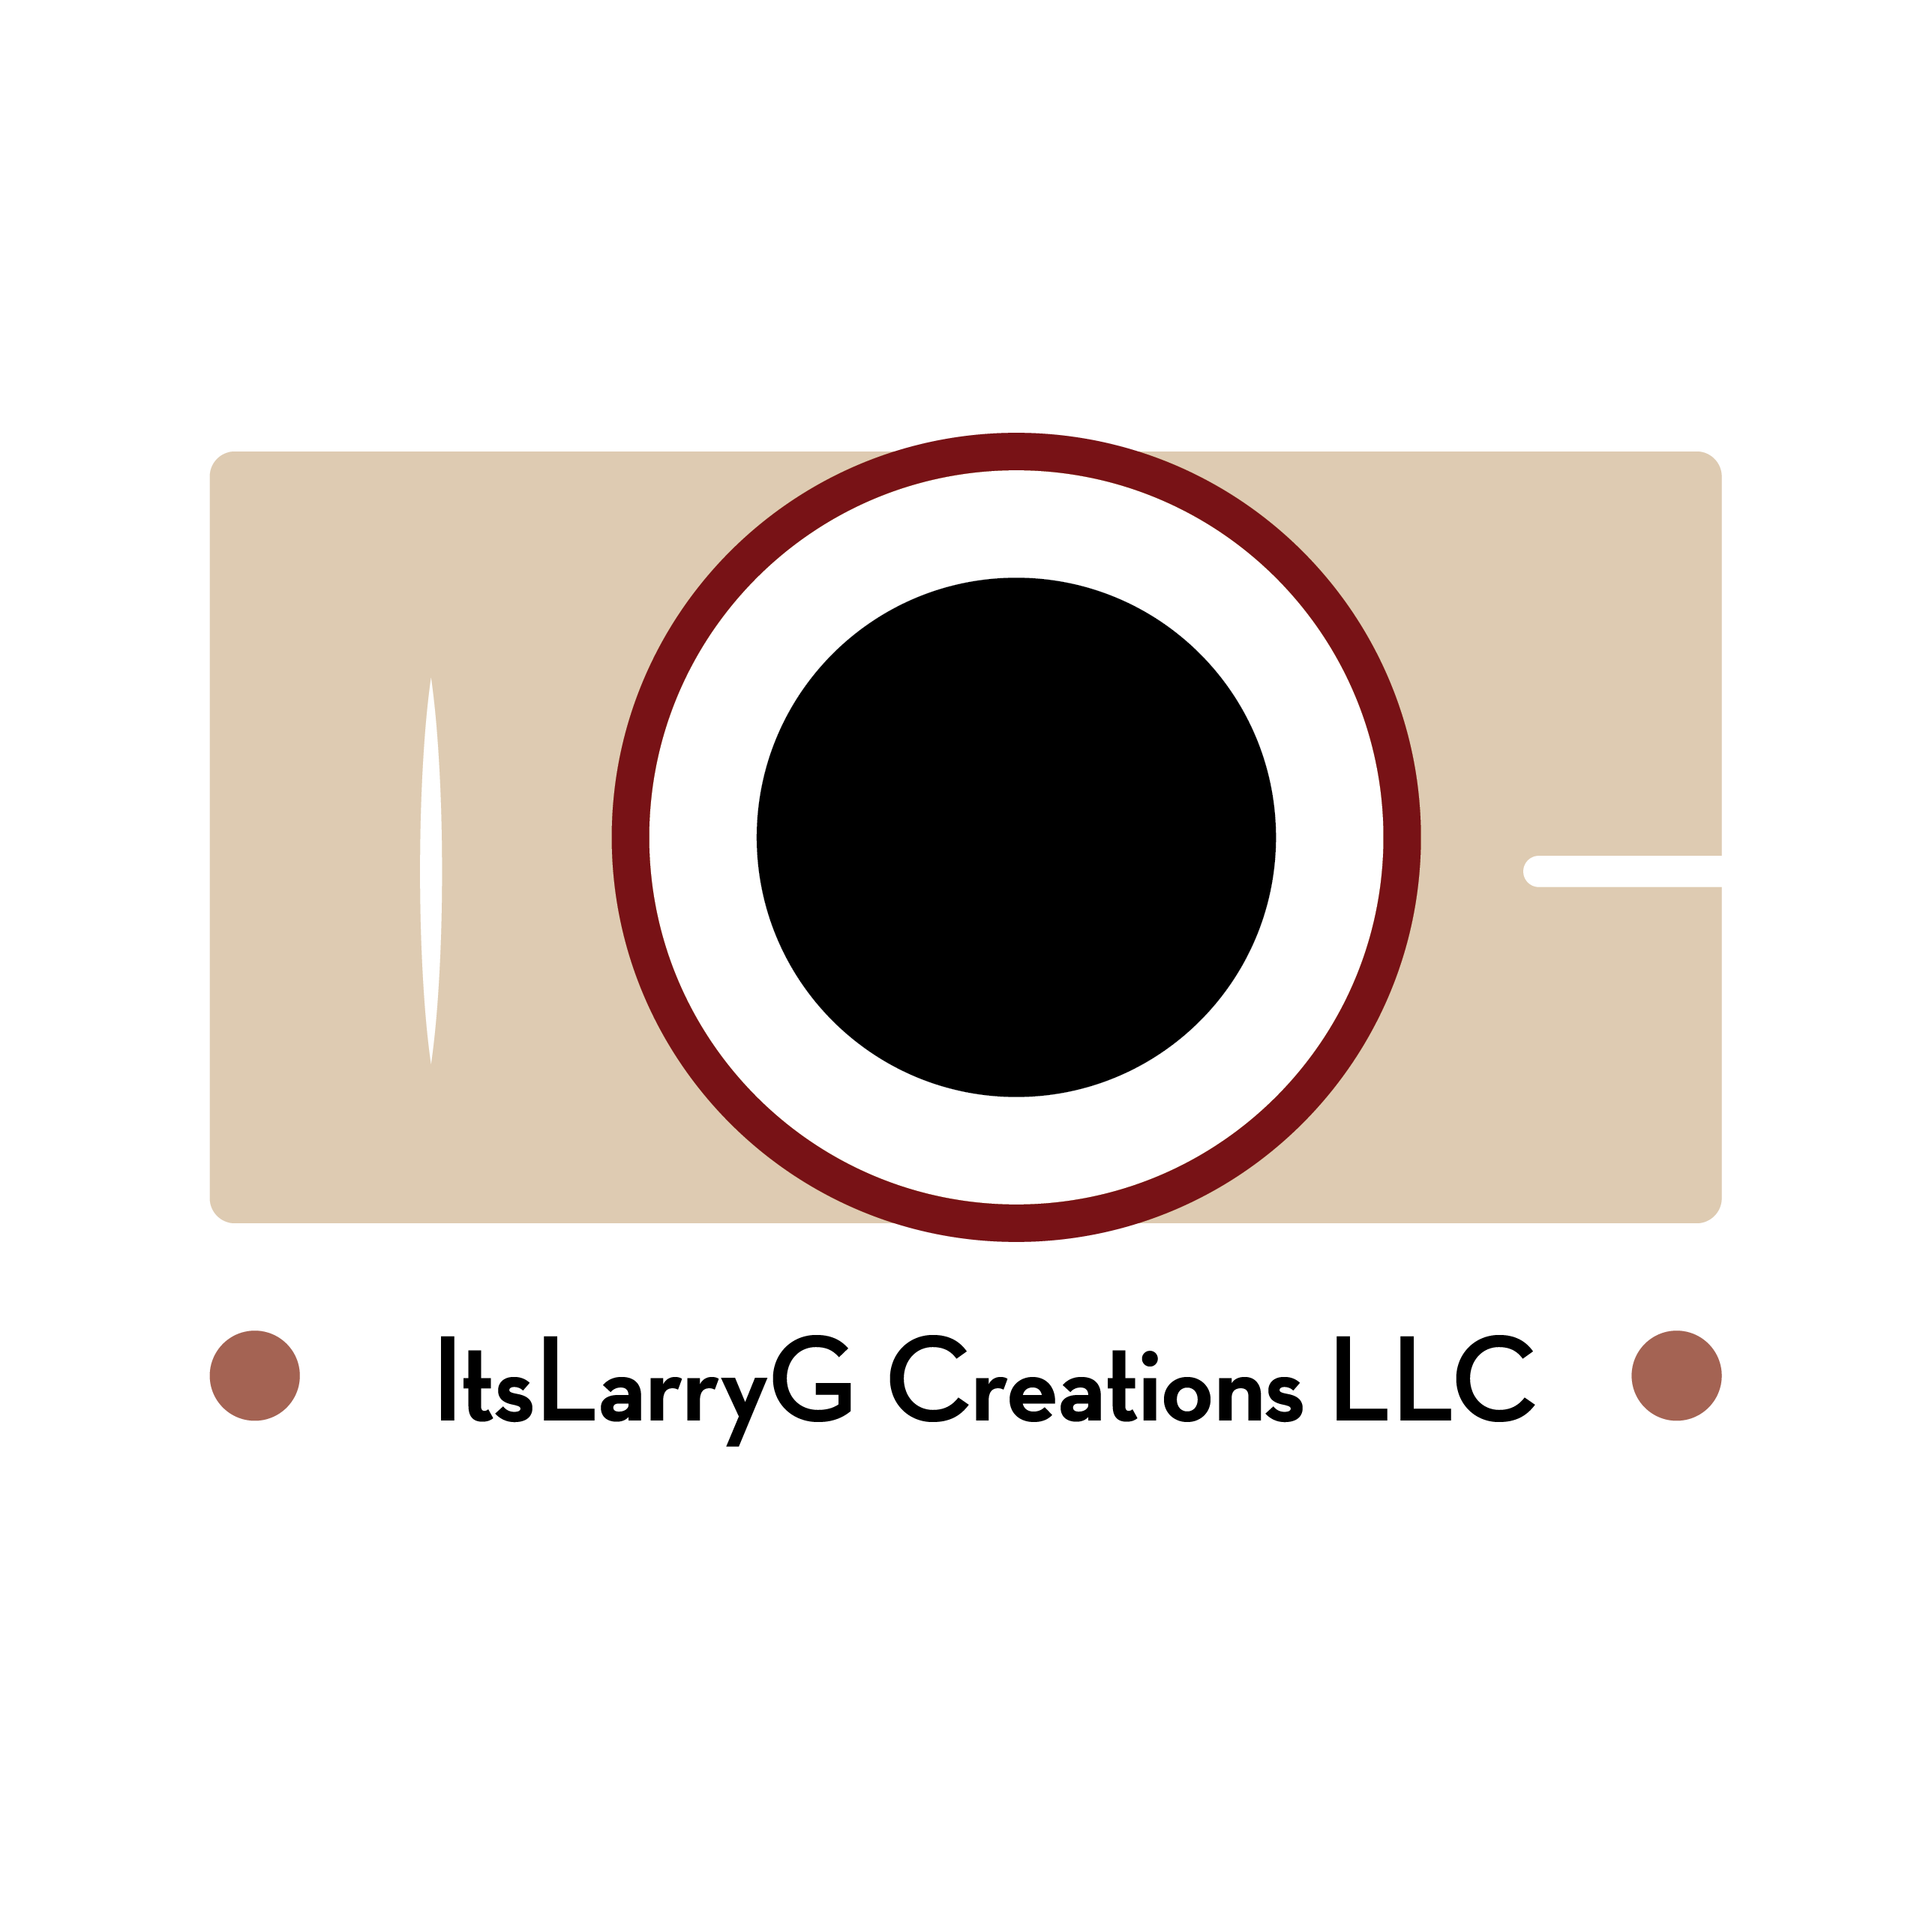 ItsLarryG Creations LLC